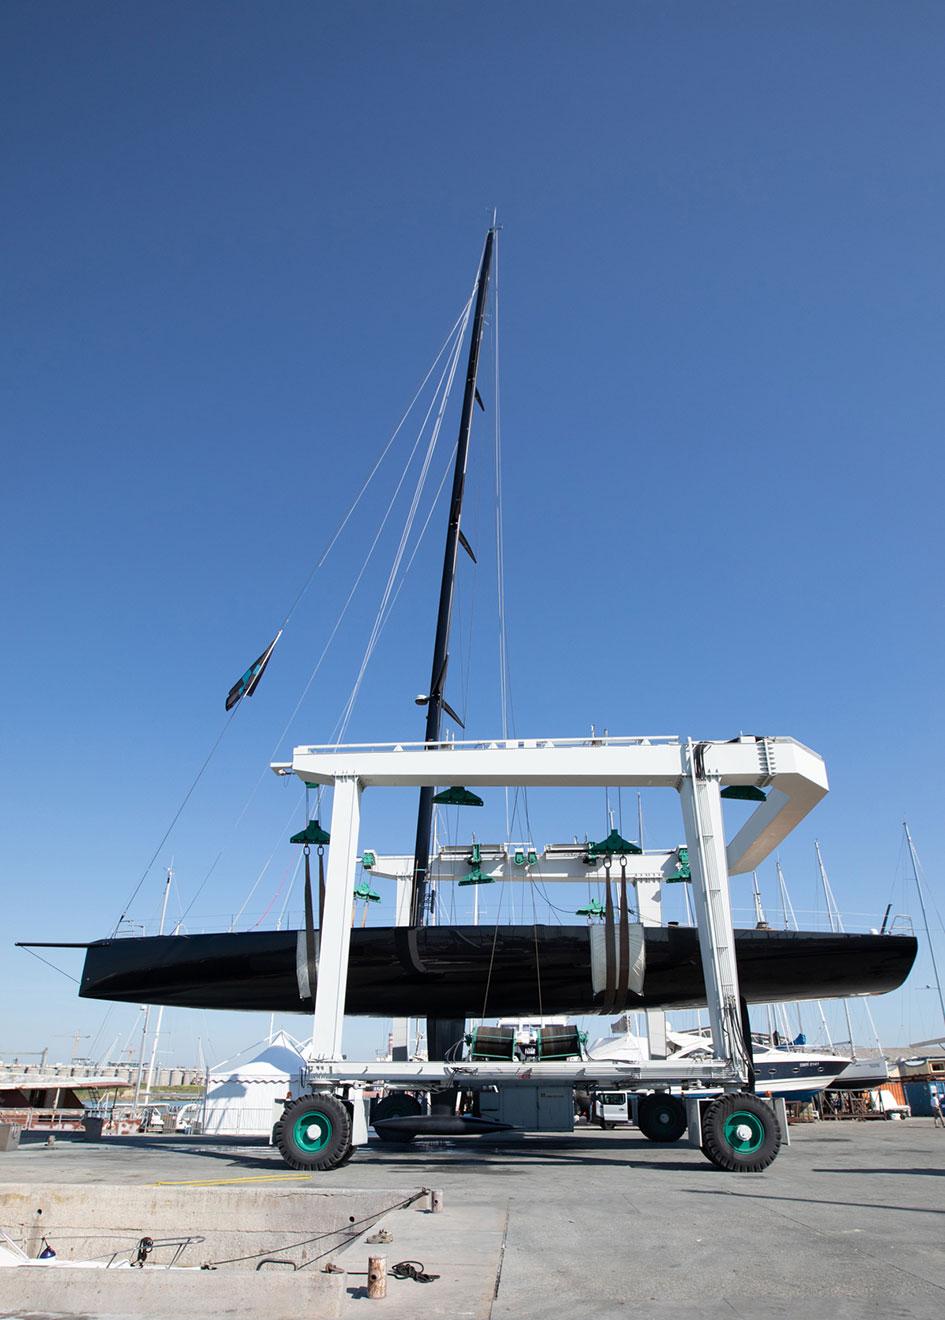 side-view-of-the-wally-93-sailing-yacht-nahita